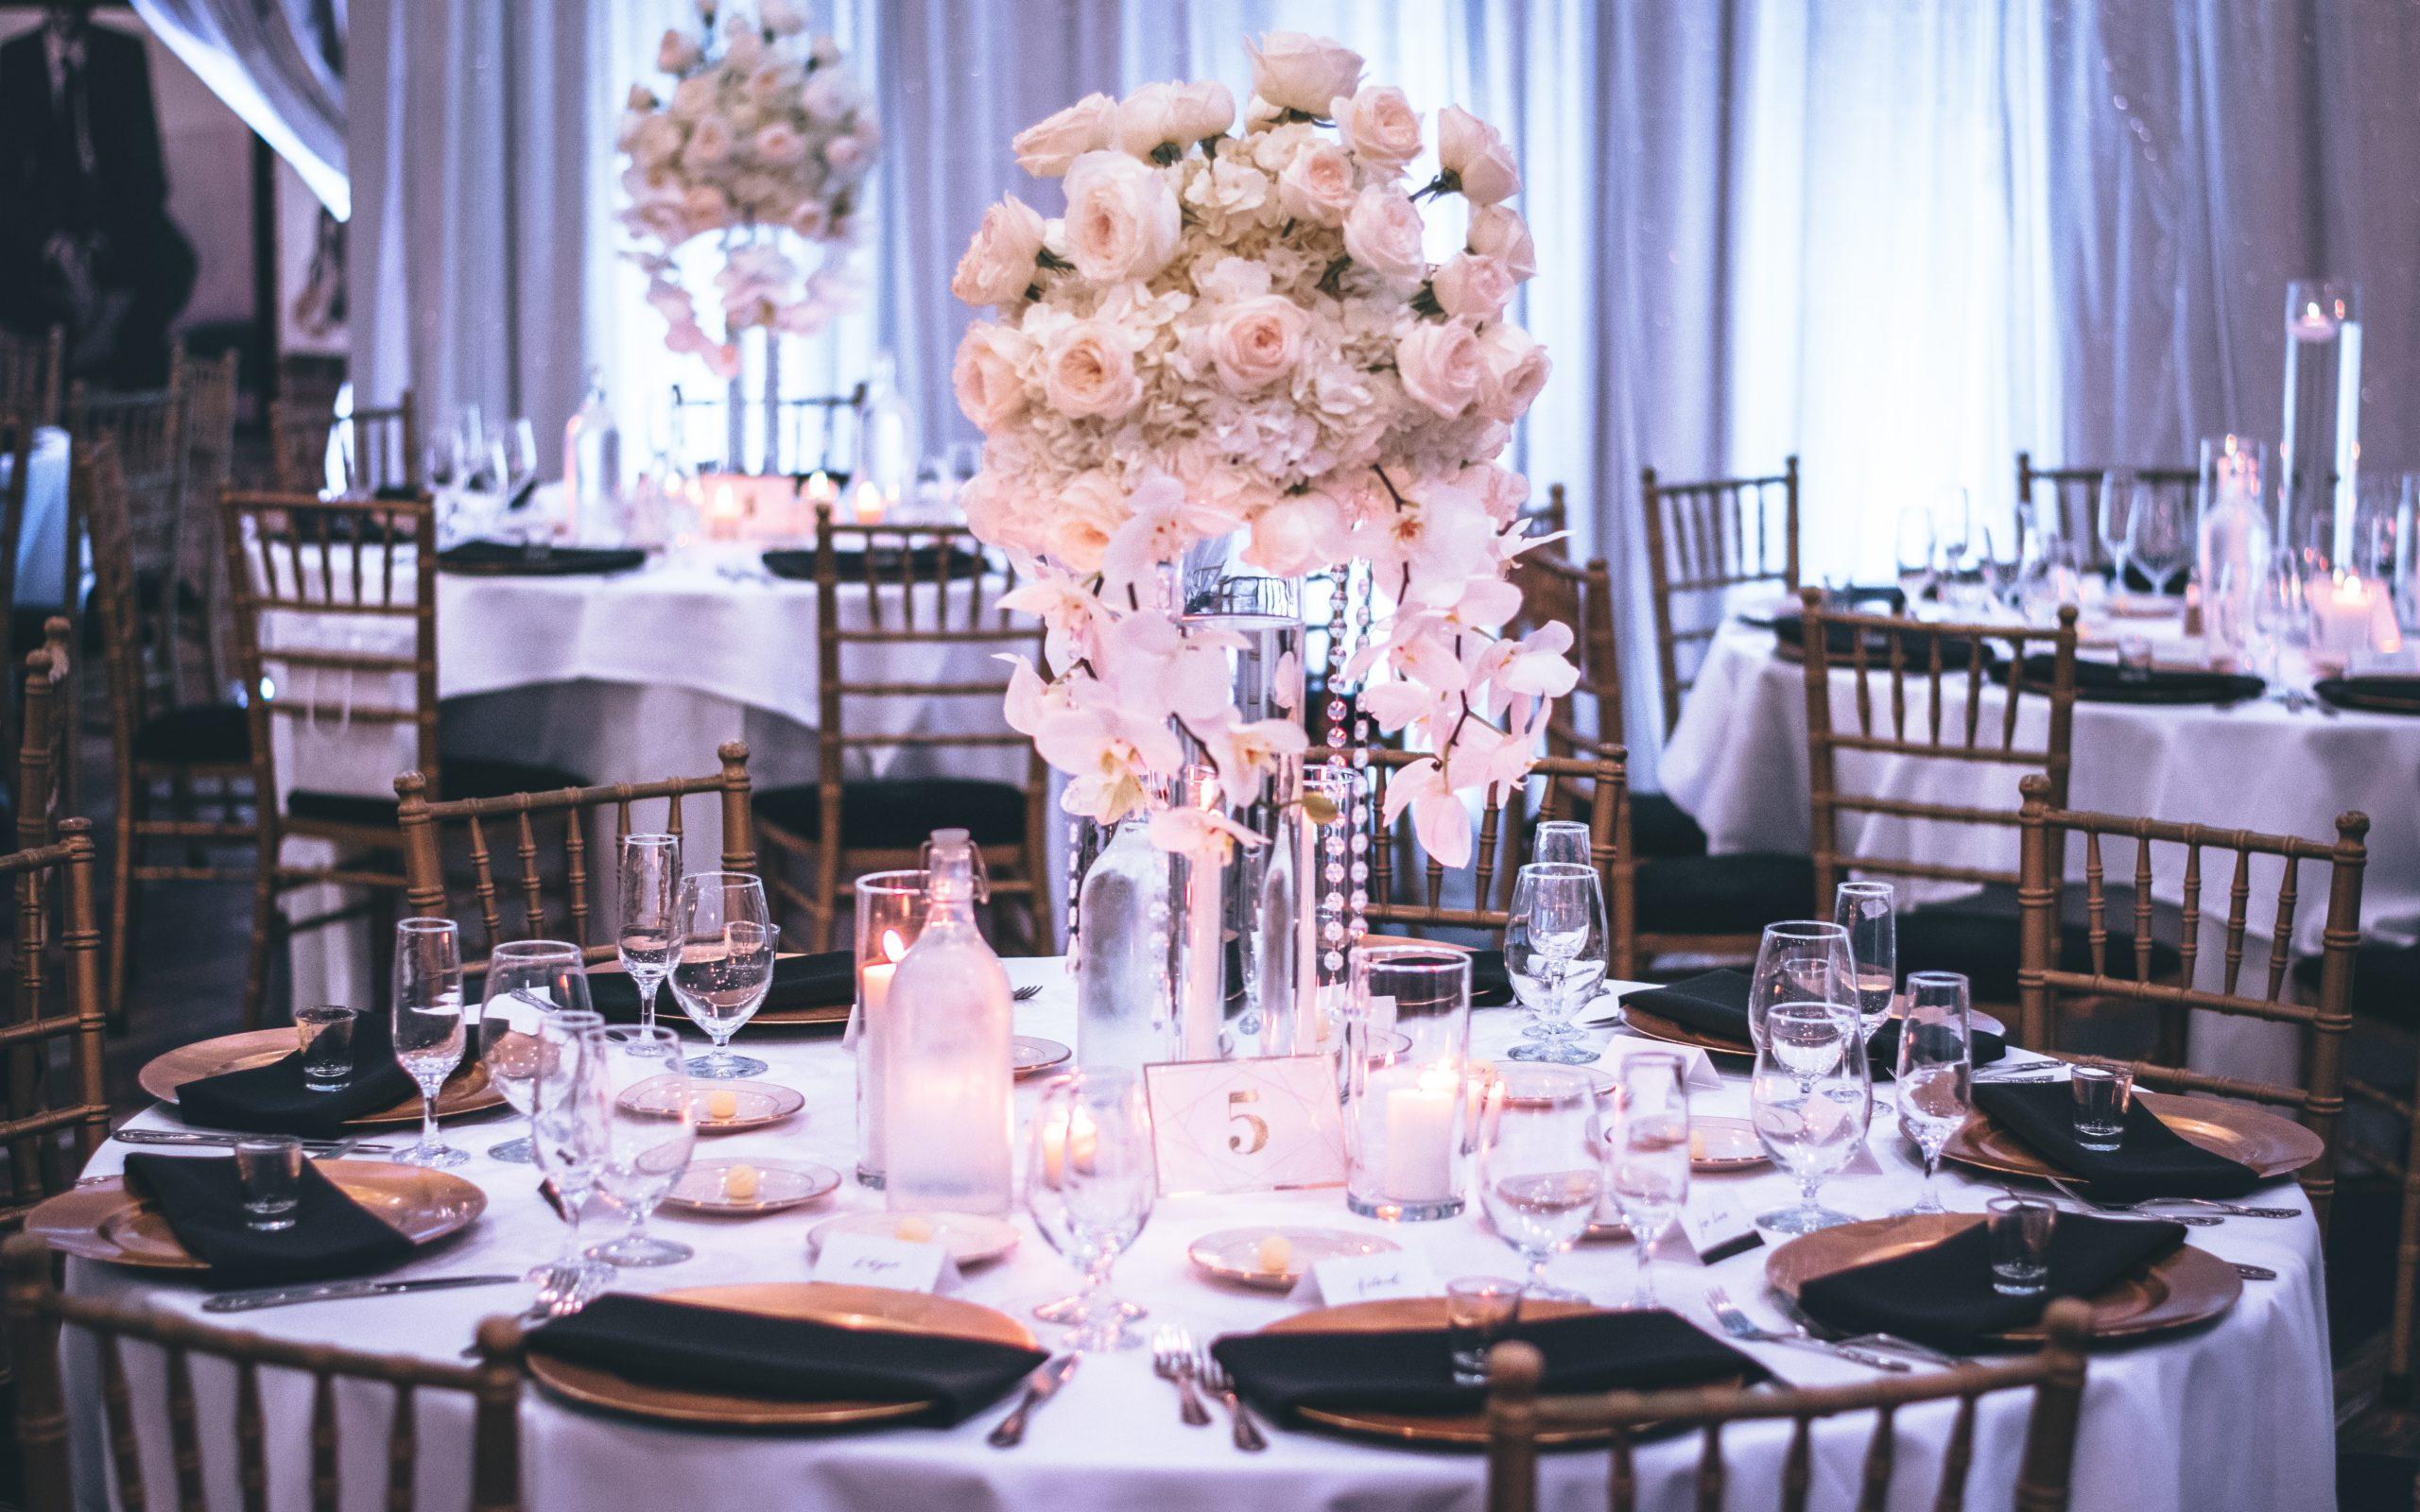 DIY Bridal Shower Decor: Glass Candles